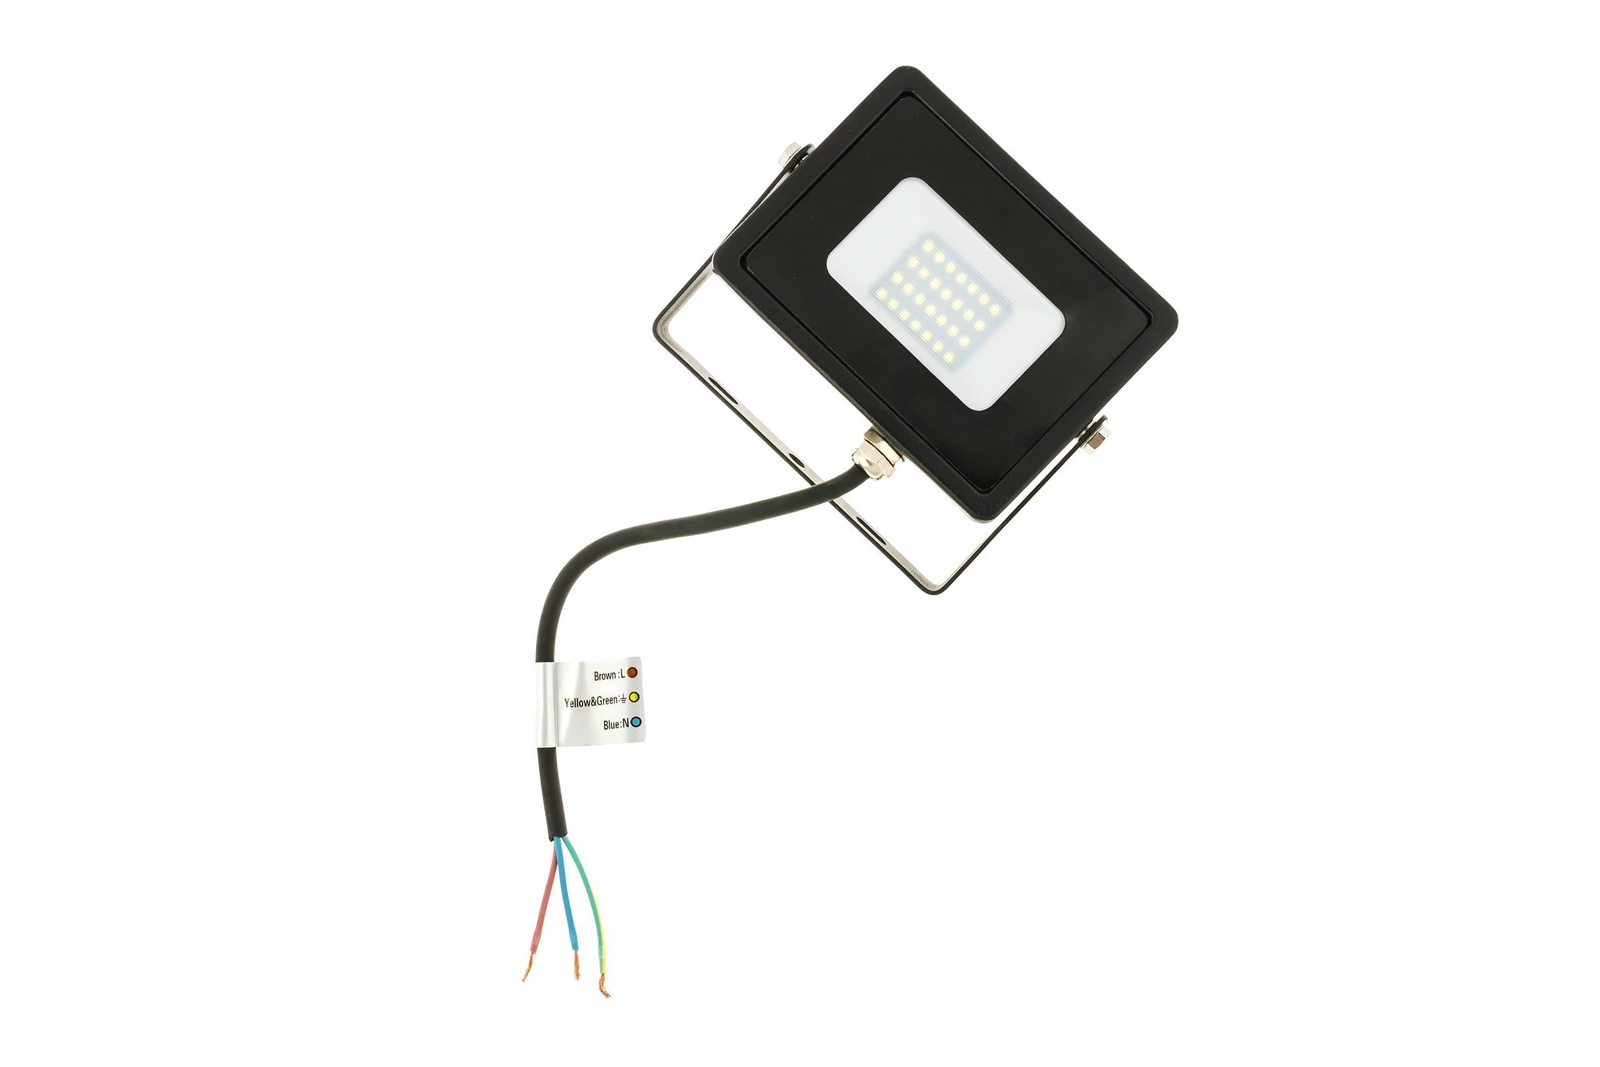 Прожектор Feron Светодиодный прожектор Feron LL-920 черный 32101, 30 Вт светодиодный прожектор ip65 50w желтый feron ll 275 12204